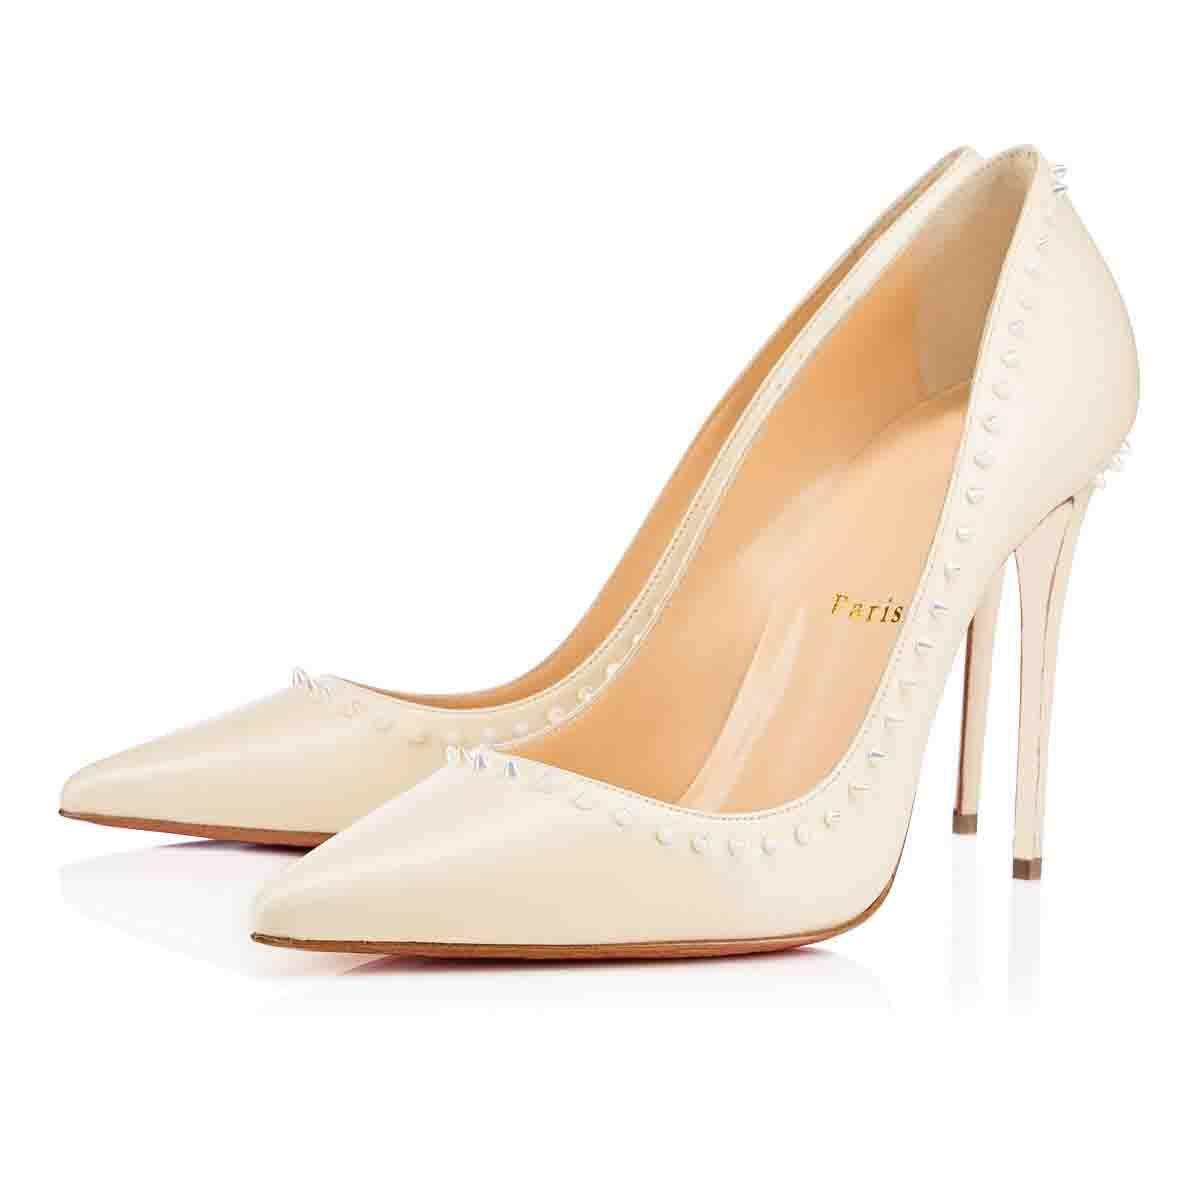 Alta Qualidade Mulheres dedo do pé Pointed Spikes Ballet Shoes Sexy Ladies (Red fundo) Salto Alto Anjalina Plano Mulheres Luxurious Bailarinas sapatos partido